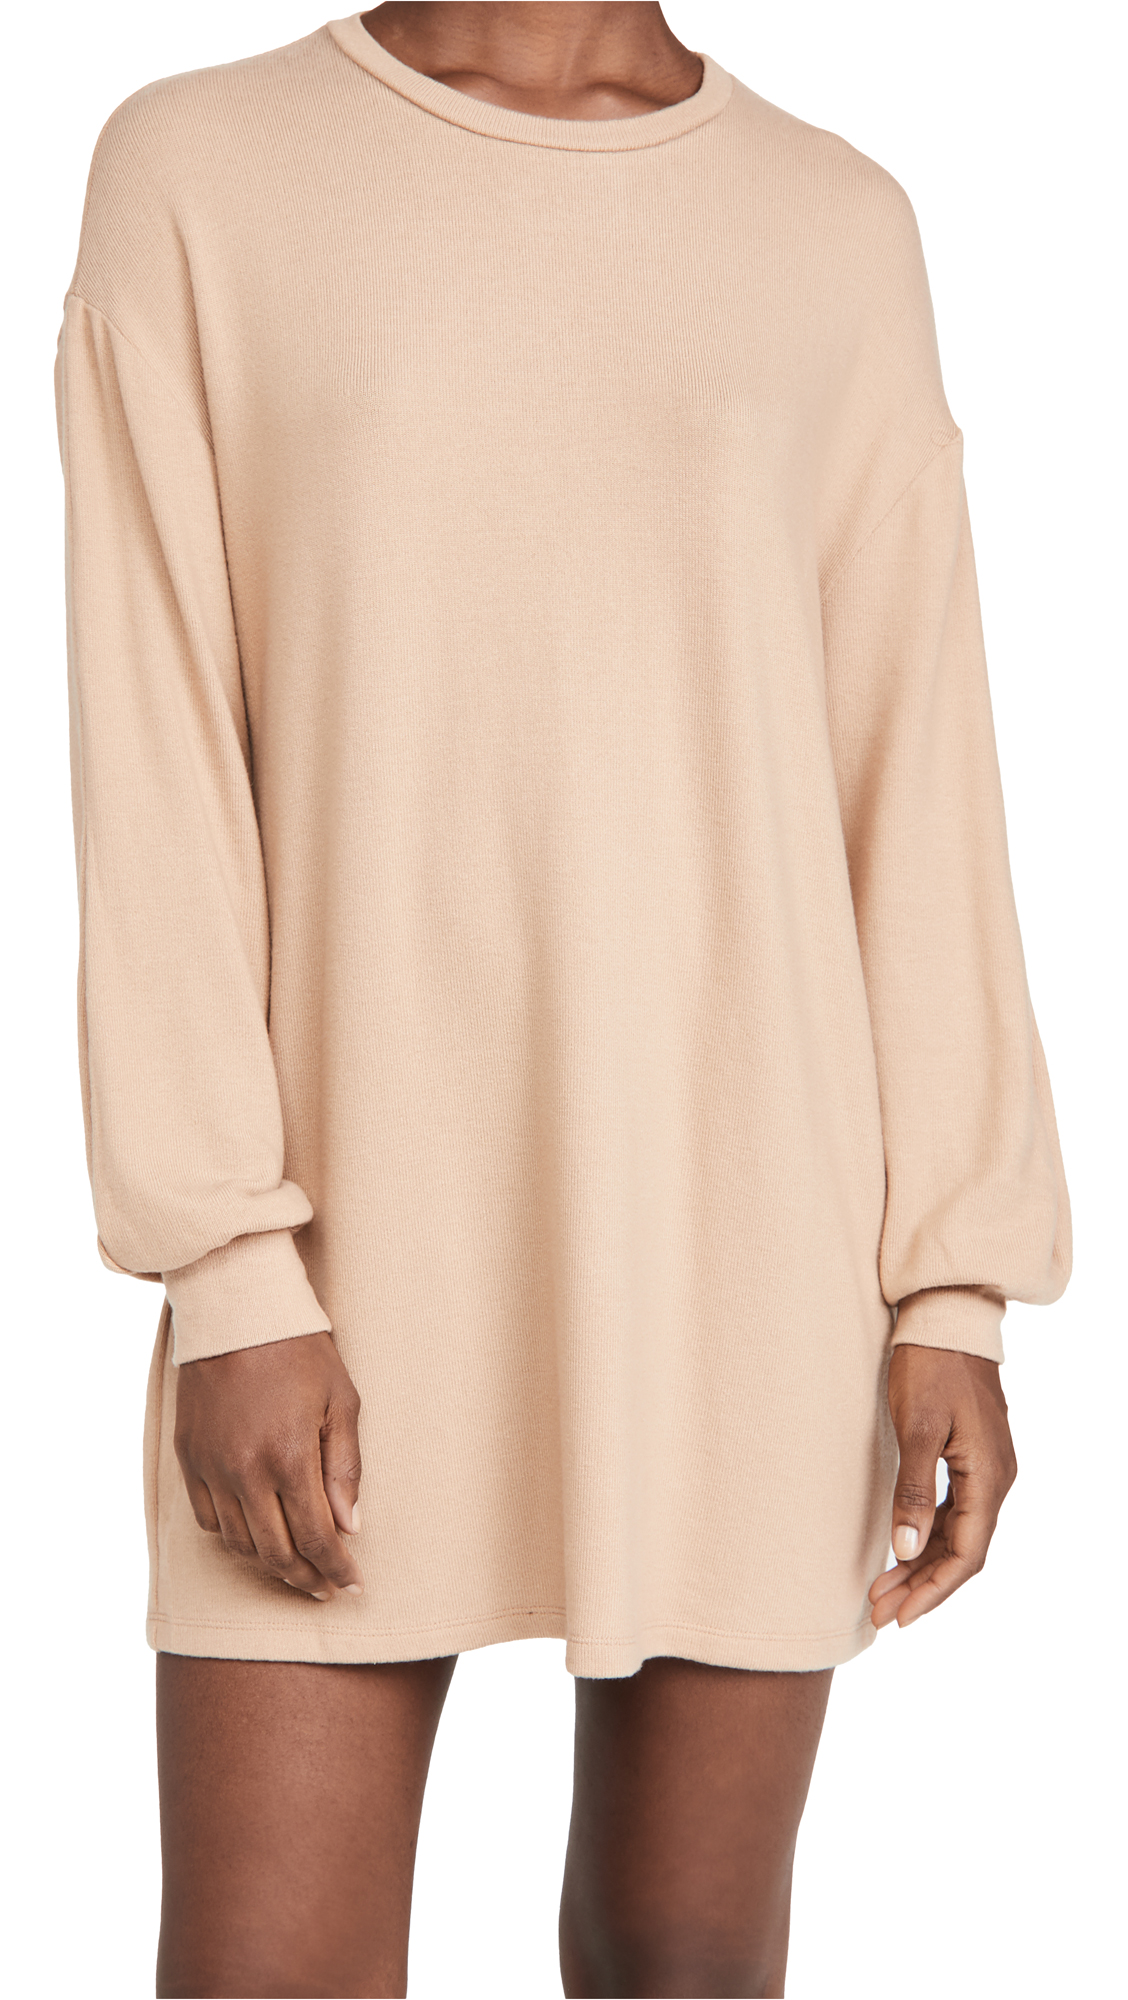 Reformation Radlee Dress